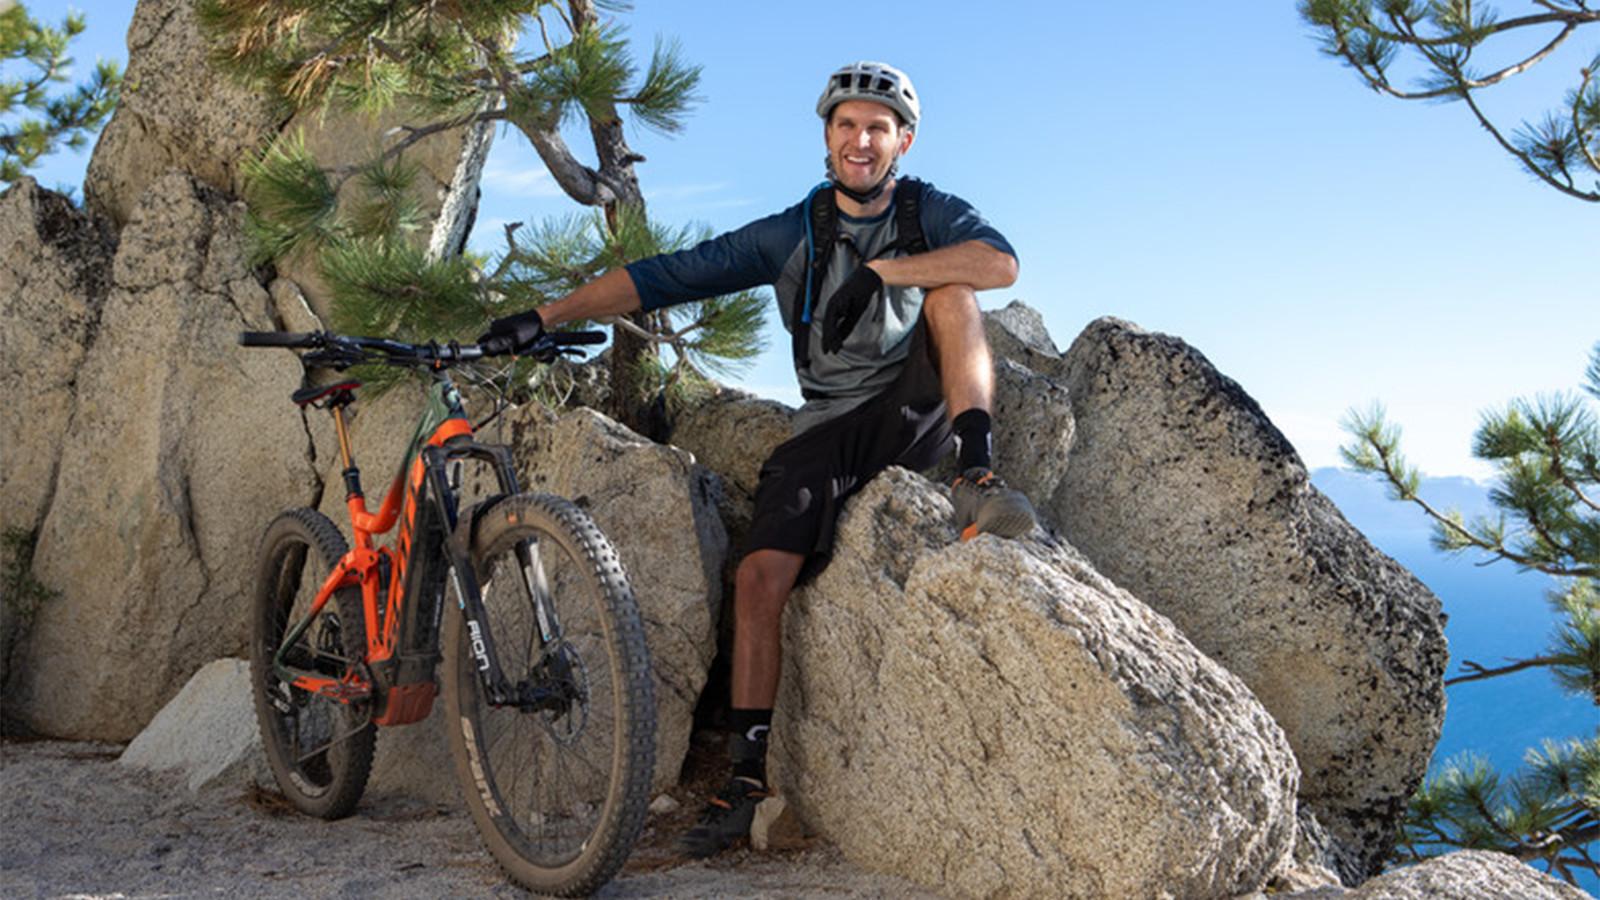 Paul Basagoitia is Back On the Bike